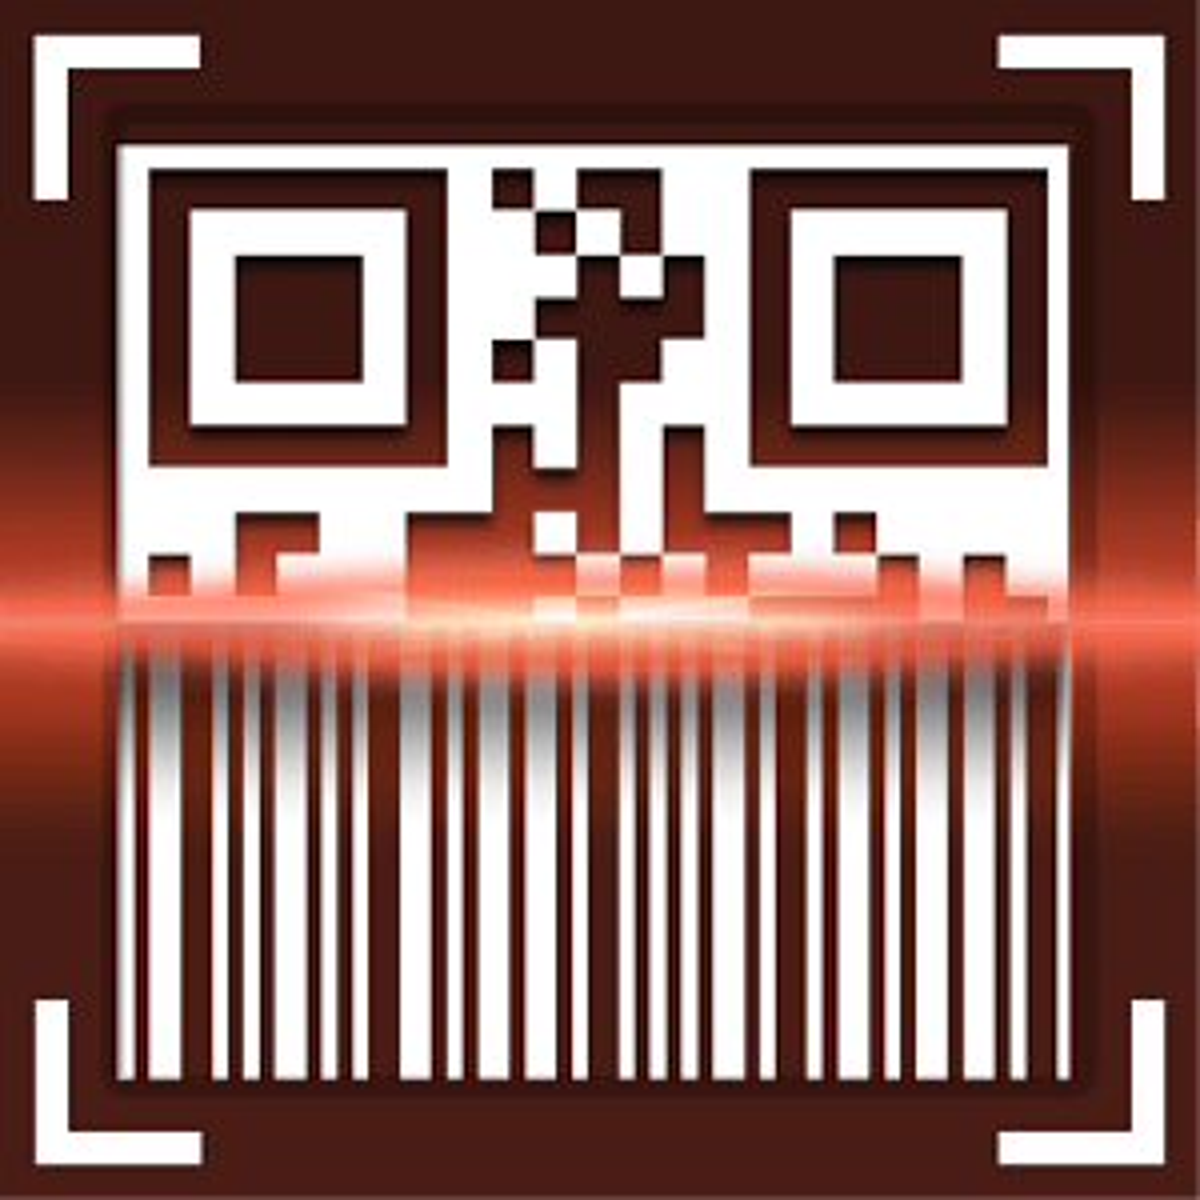 QR Scanner - Barcode Reader